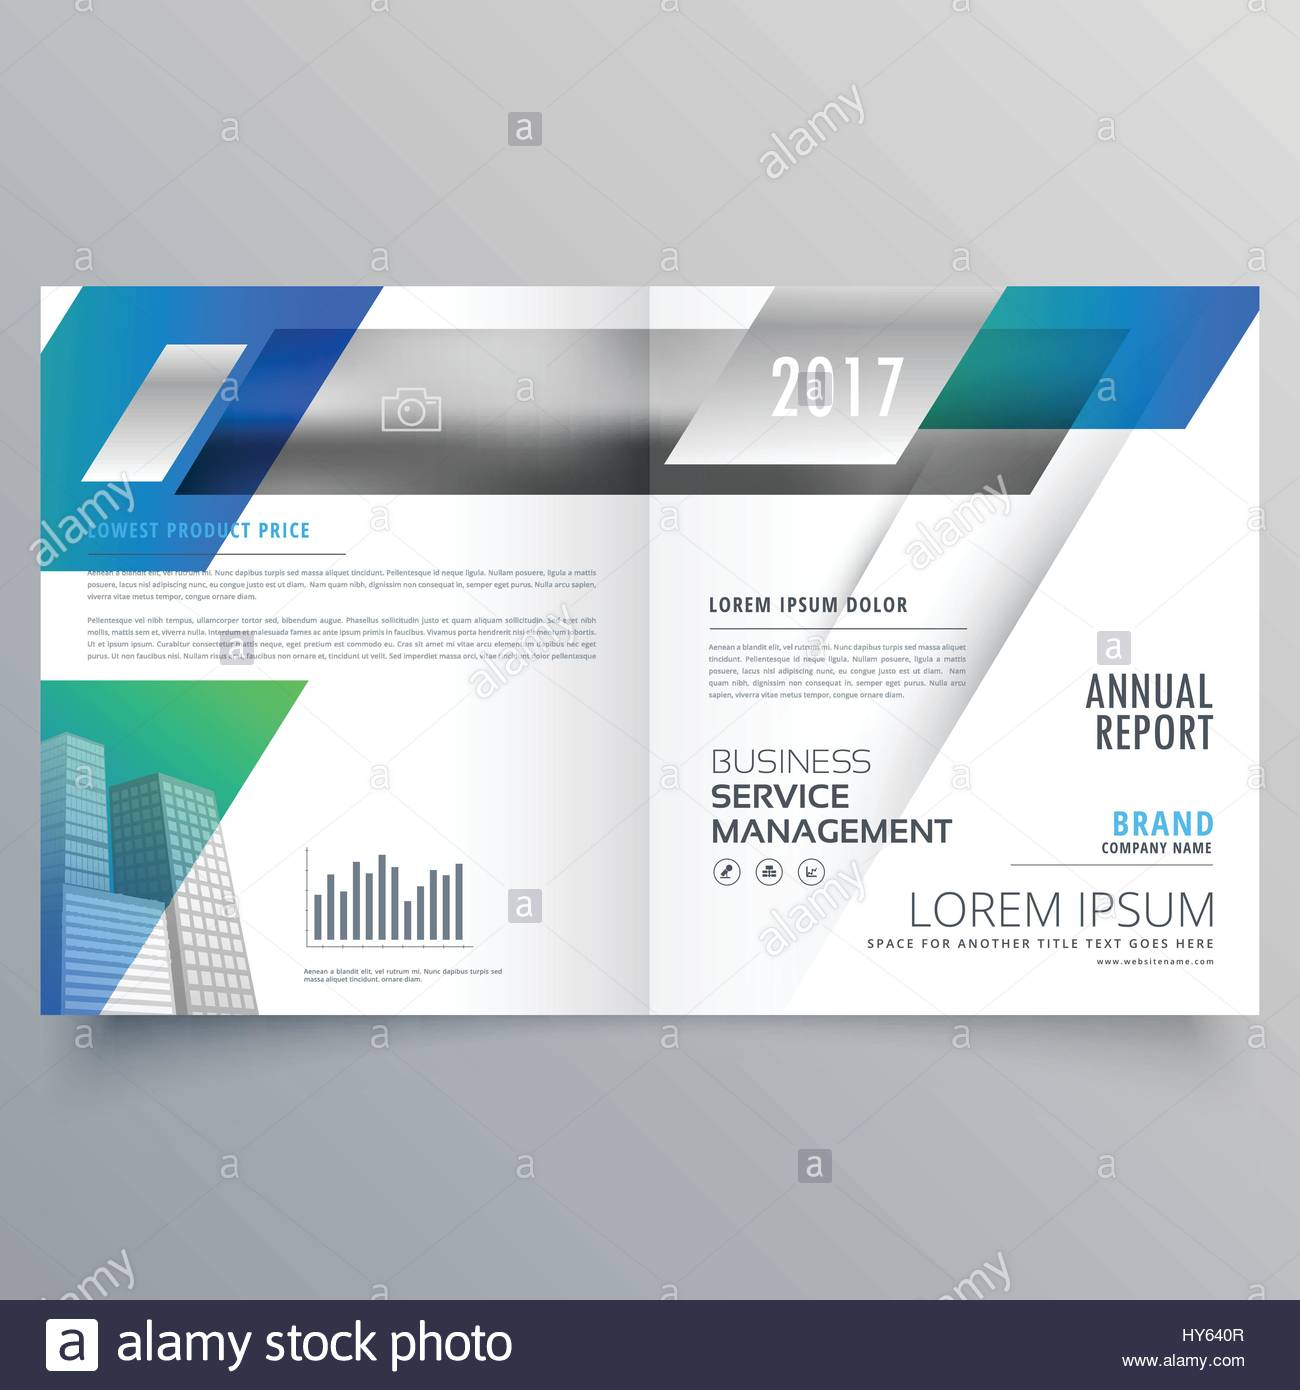 Business Bifold Brochure Template Vector Design Stock Vector Art - Property management brochure templates